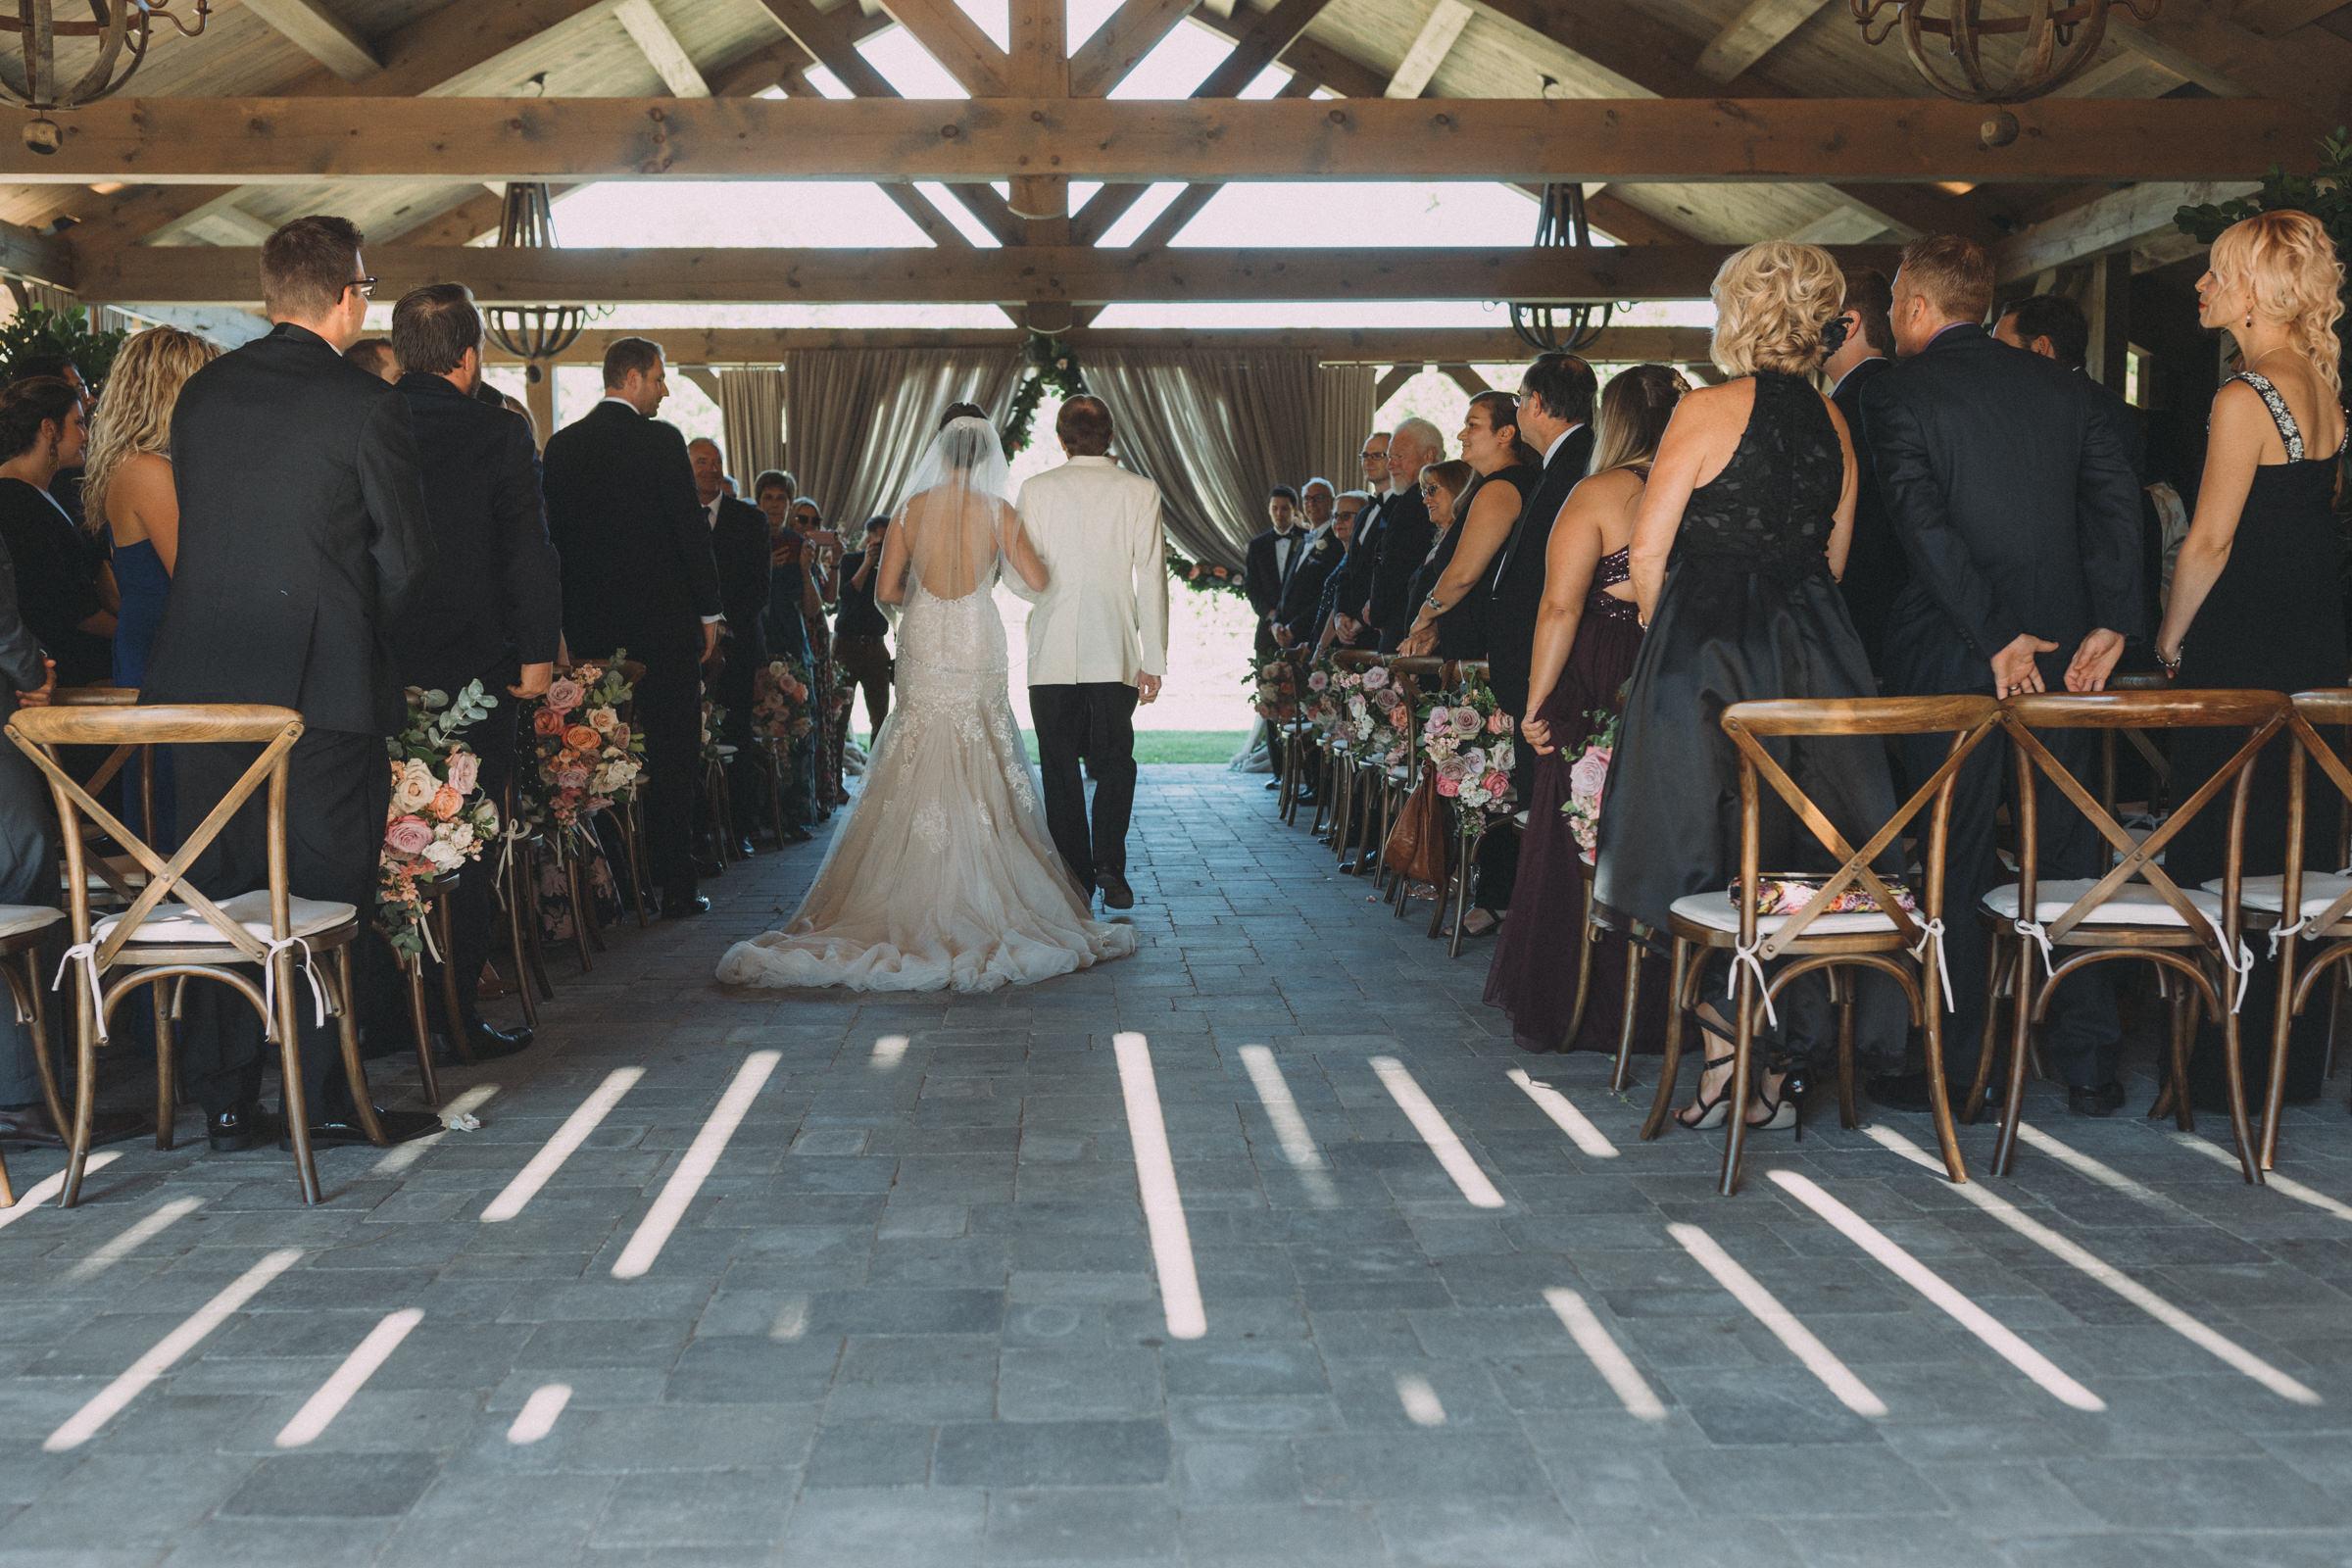 Langdon-Hall-wedding-photography-Cambridge-by-Sam-Wong-of-Visual-Cravings_Sarah-Ryan_35.jpg